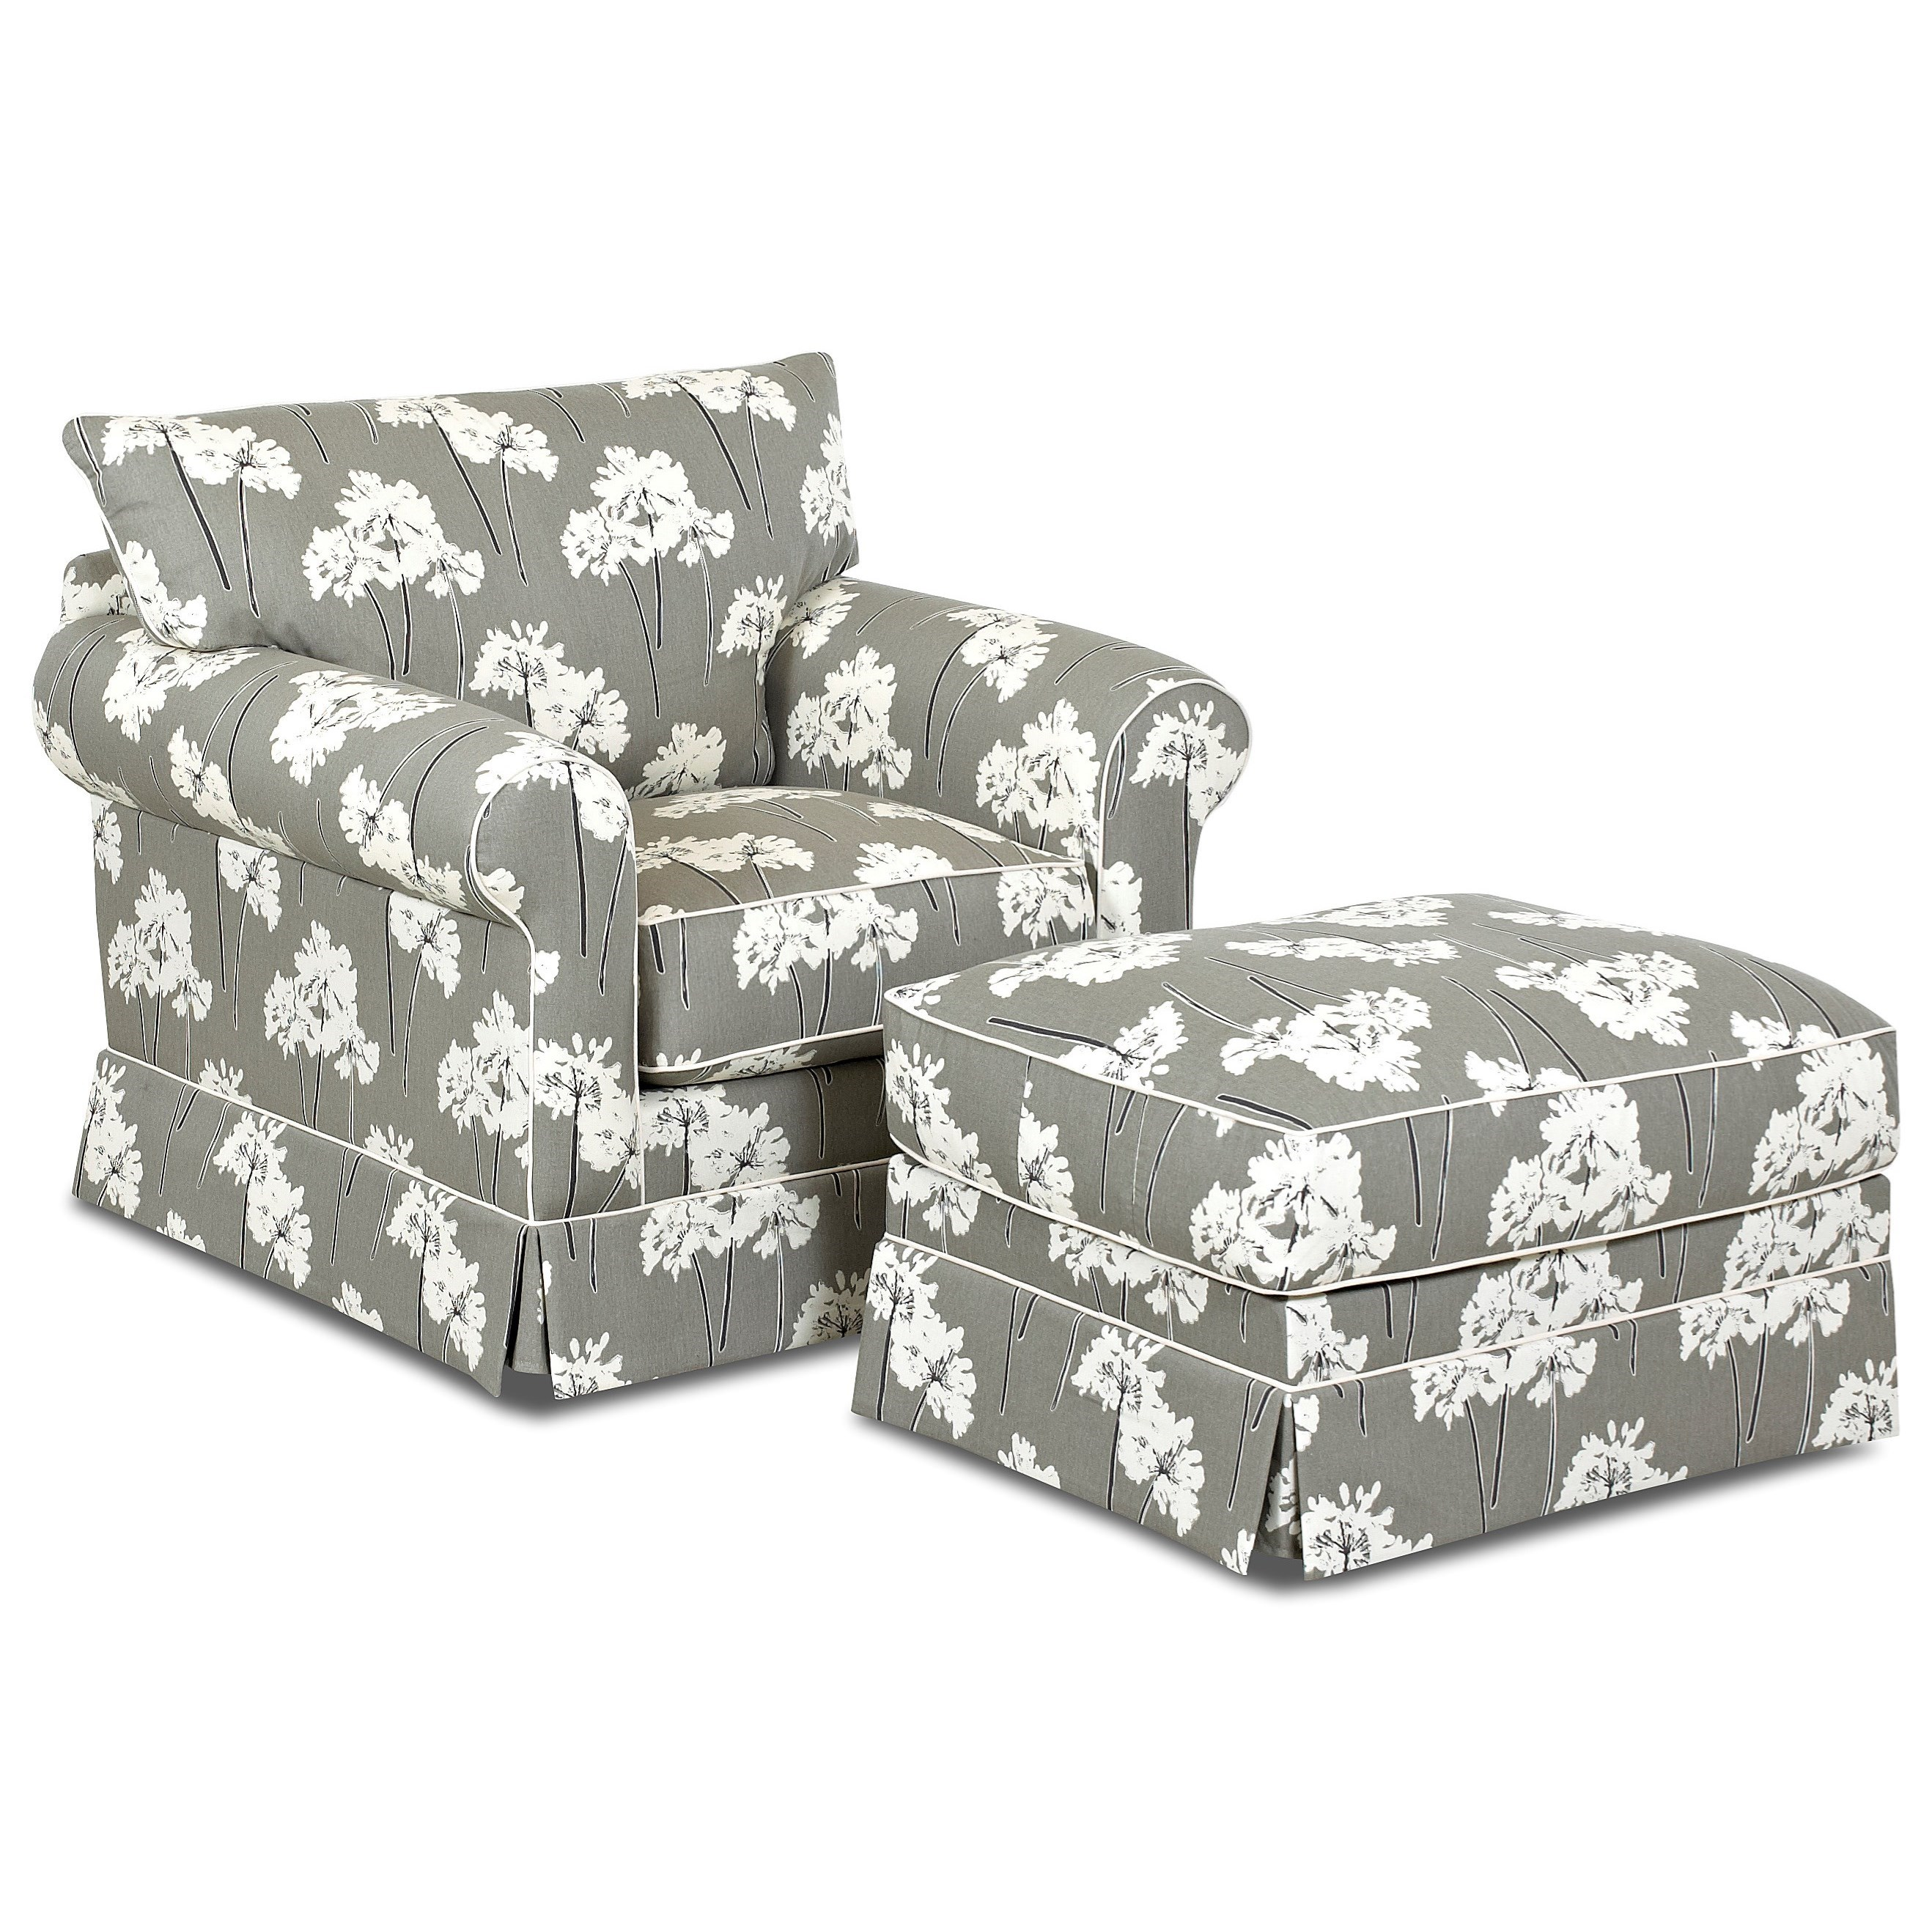 Jenny Chair & Ottoman Set by Klaussner at Johnny Janosik